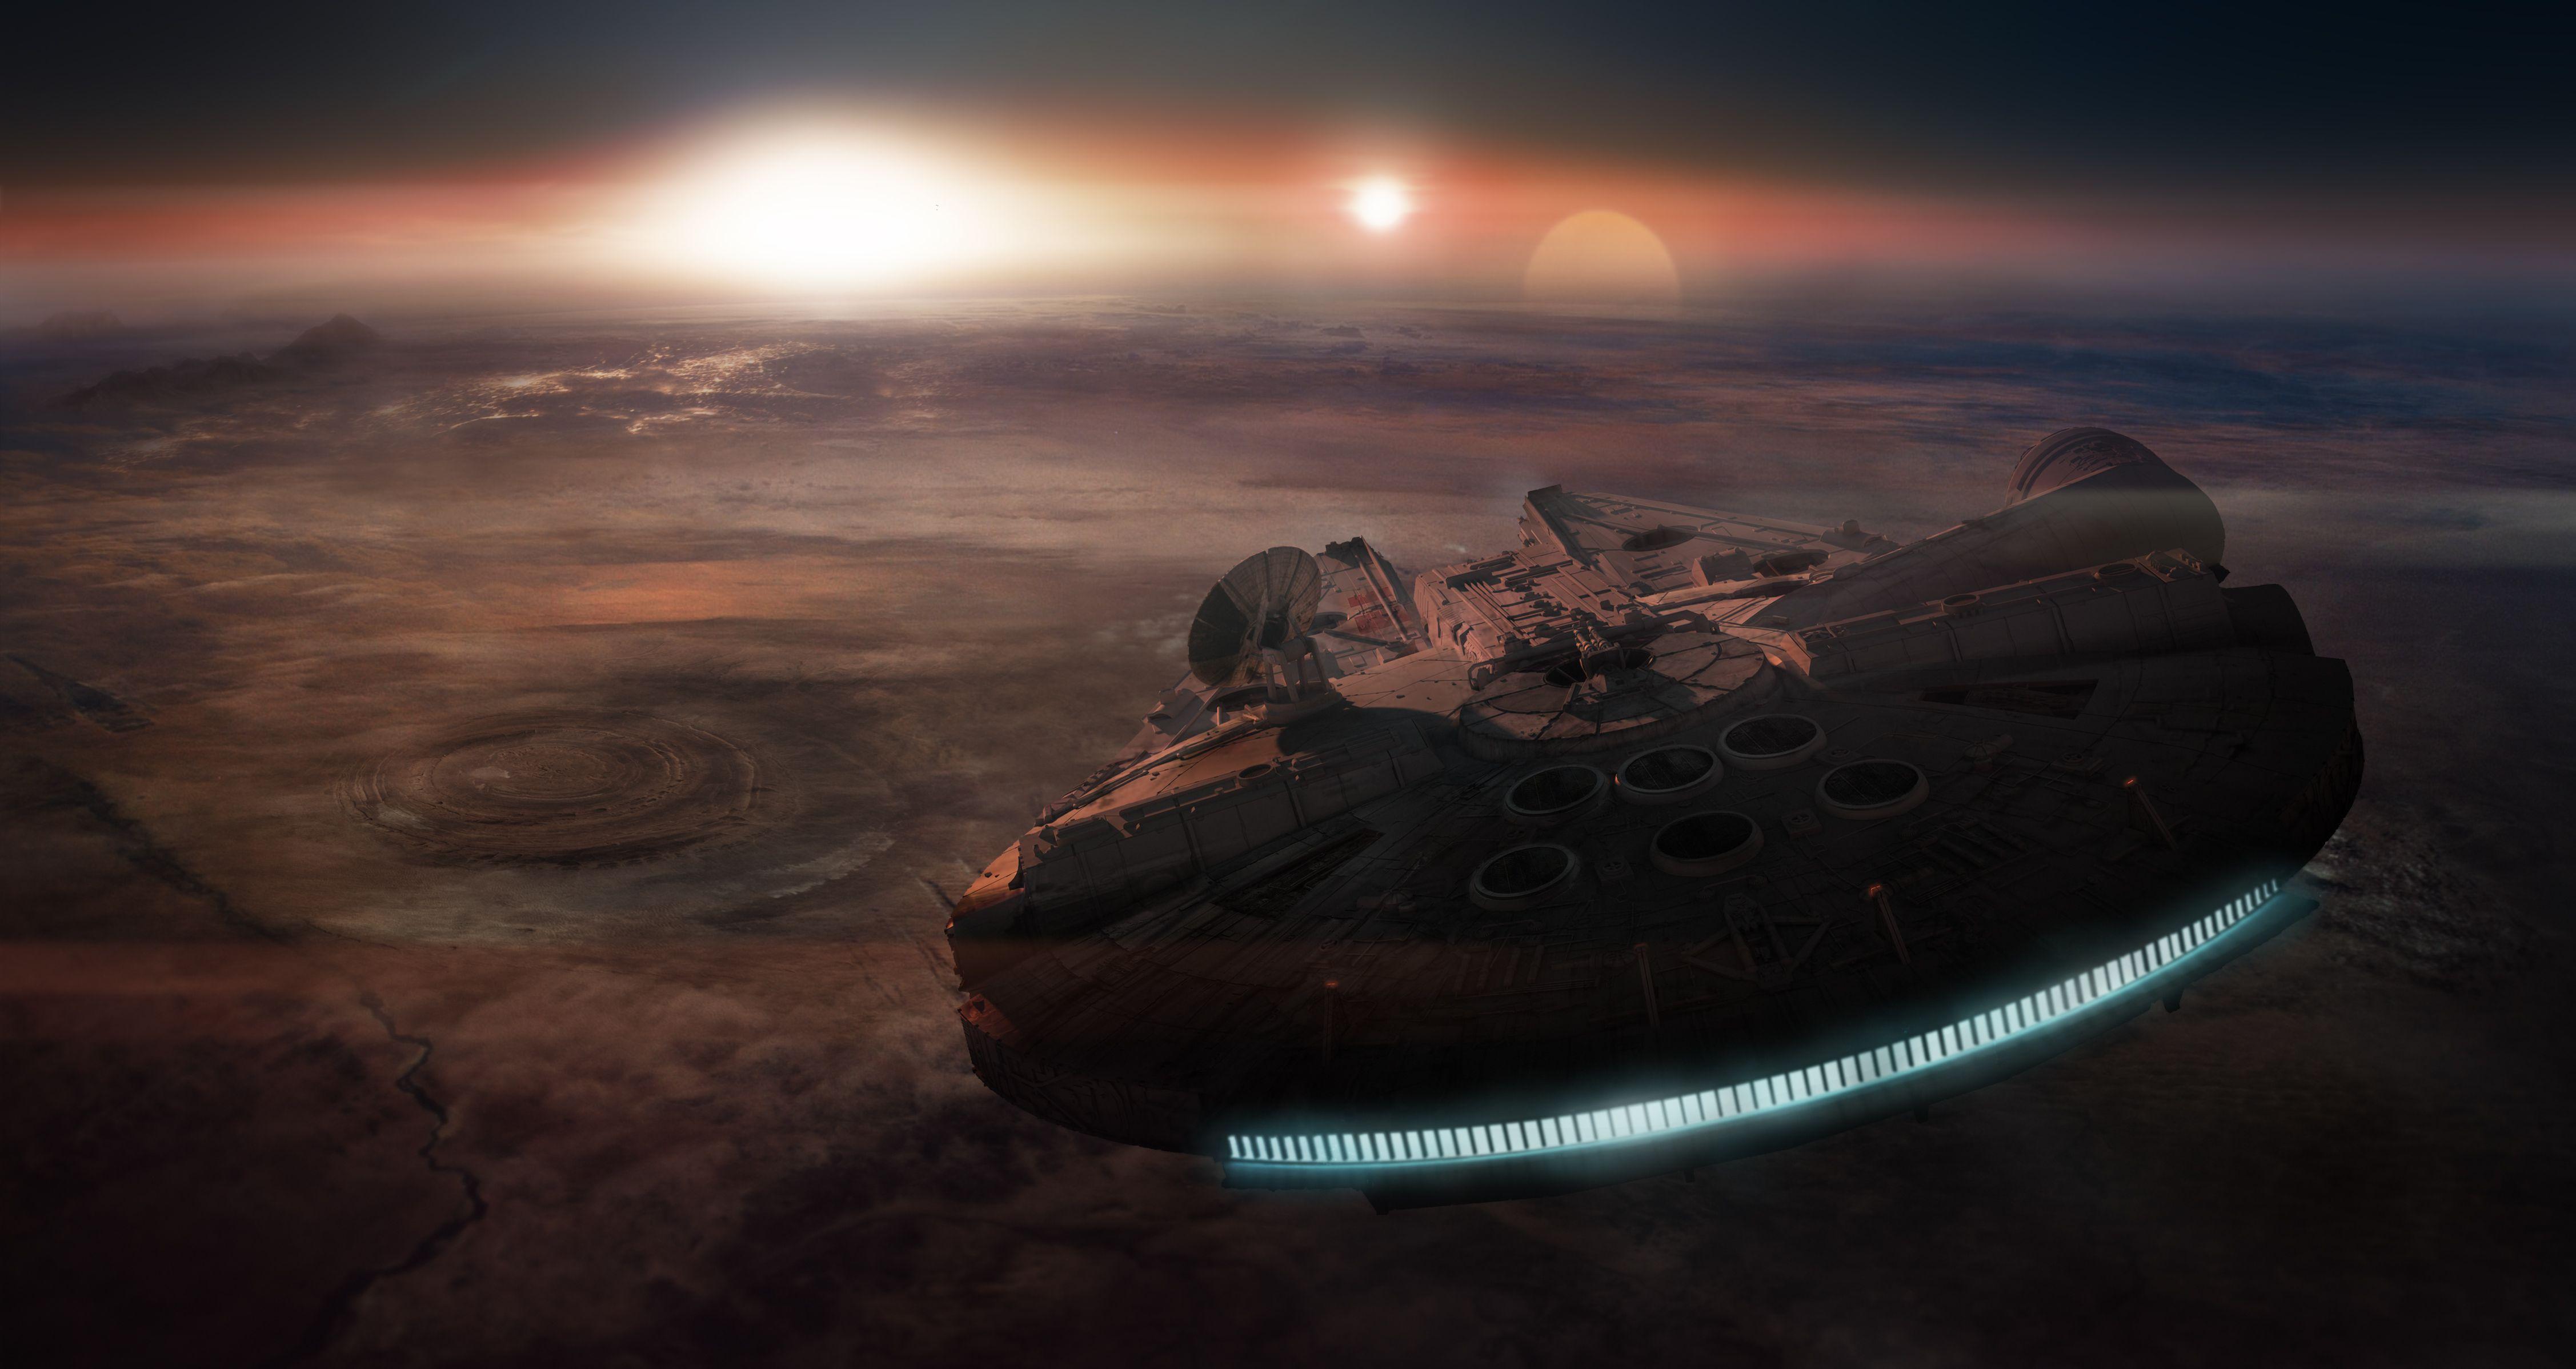 Millenium Falcon Star wars wallpaper, Background hd